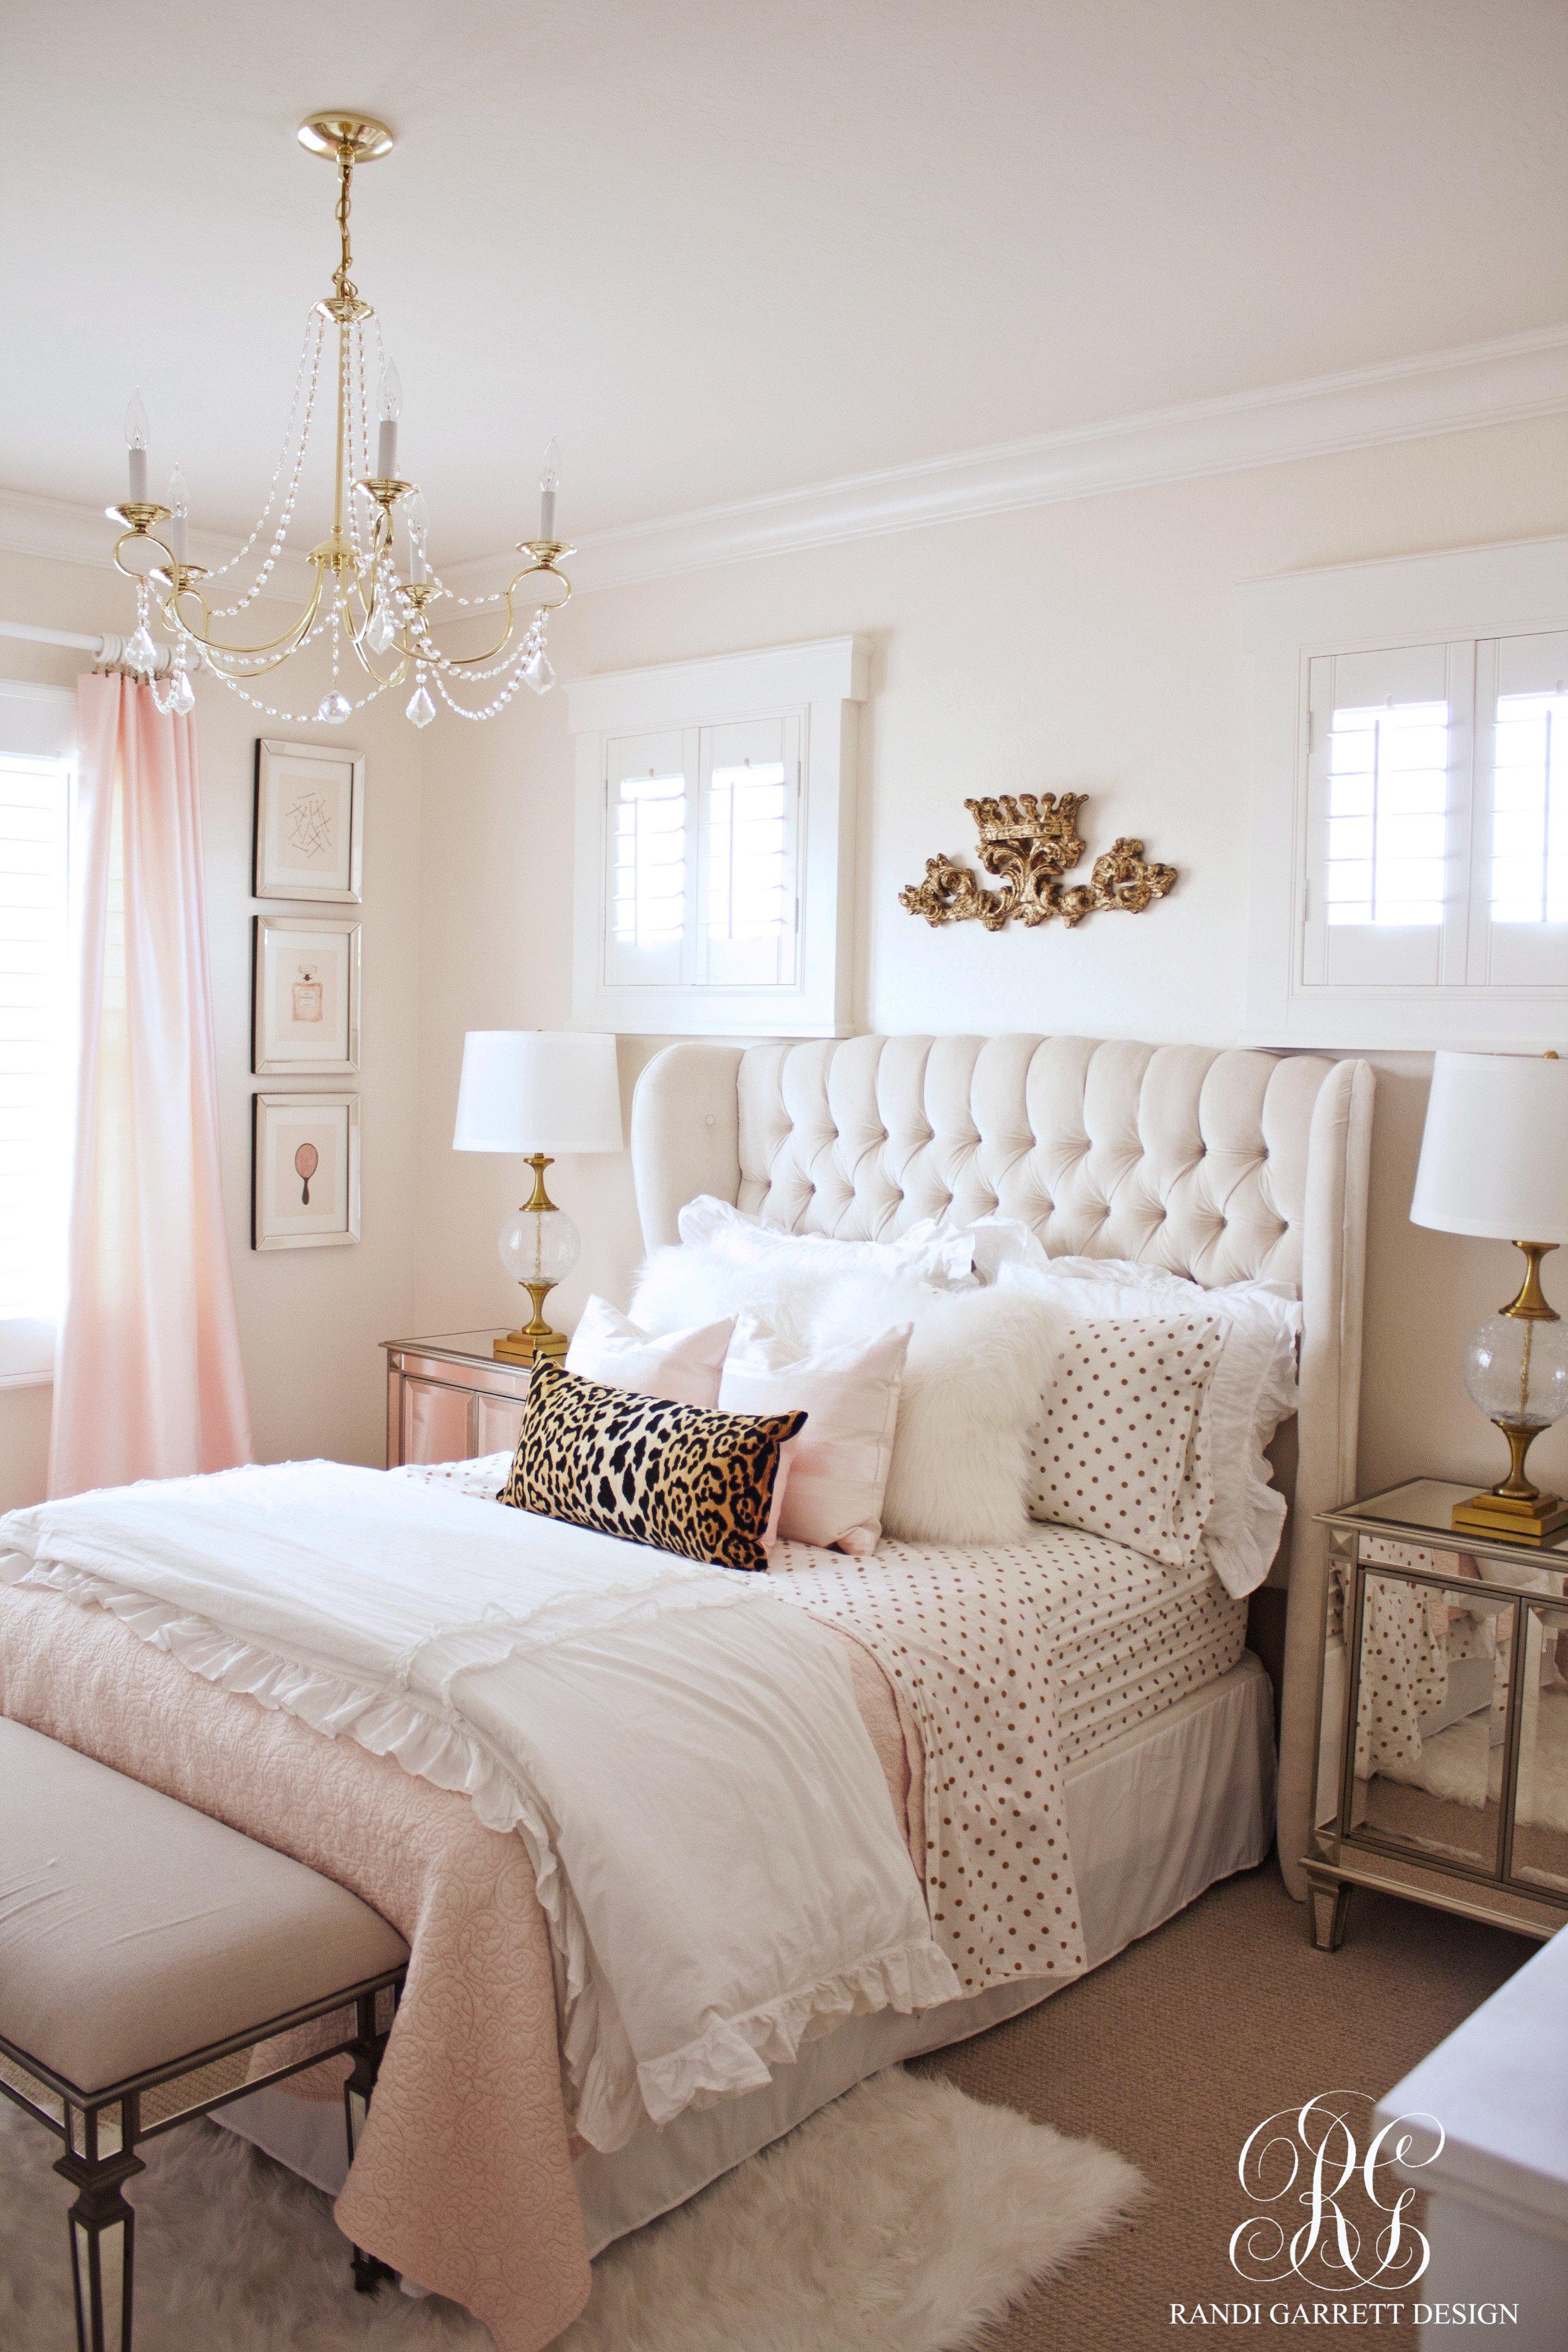 Girl Bedroom Decorating Ideas Awesome Pink and Gold Girl S Bedroom Makeover Randi Garrett Design